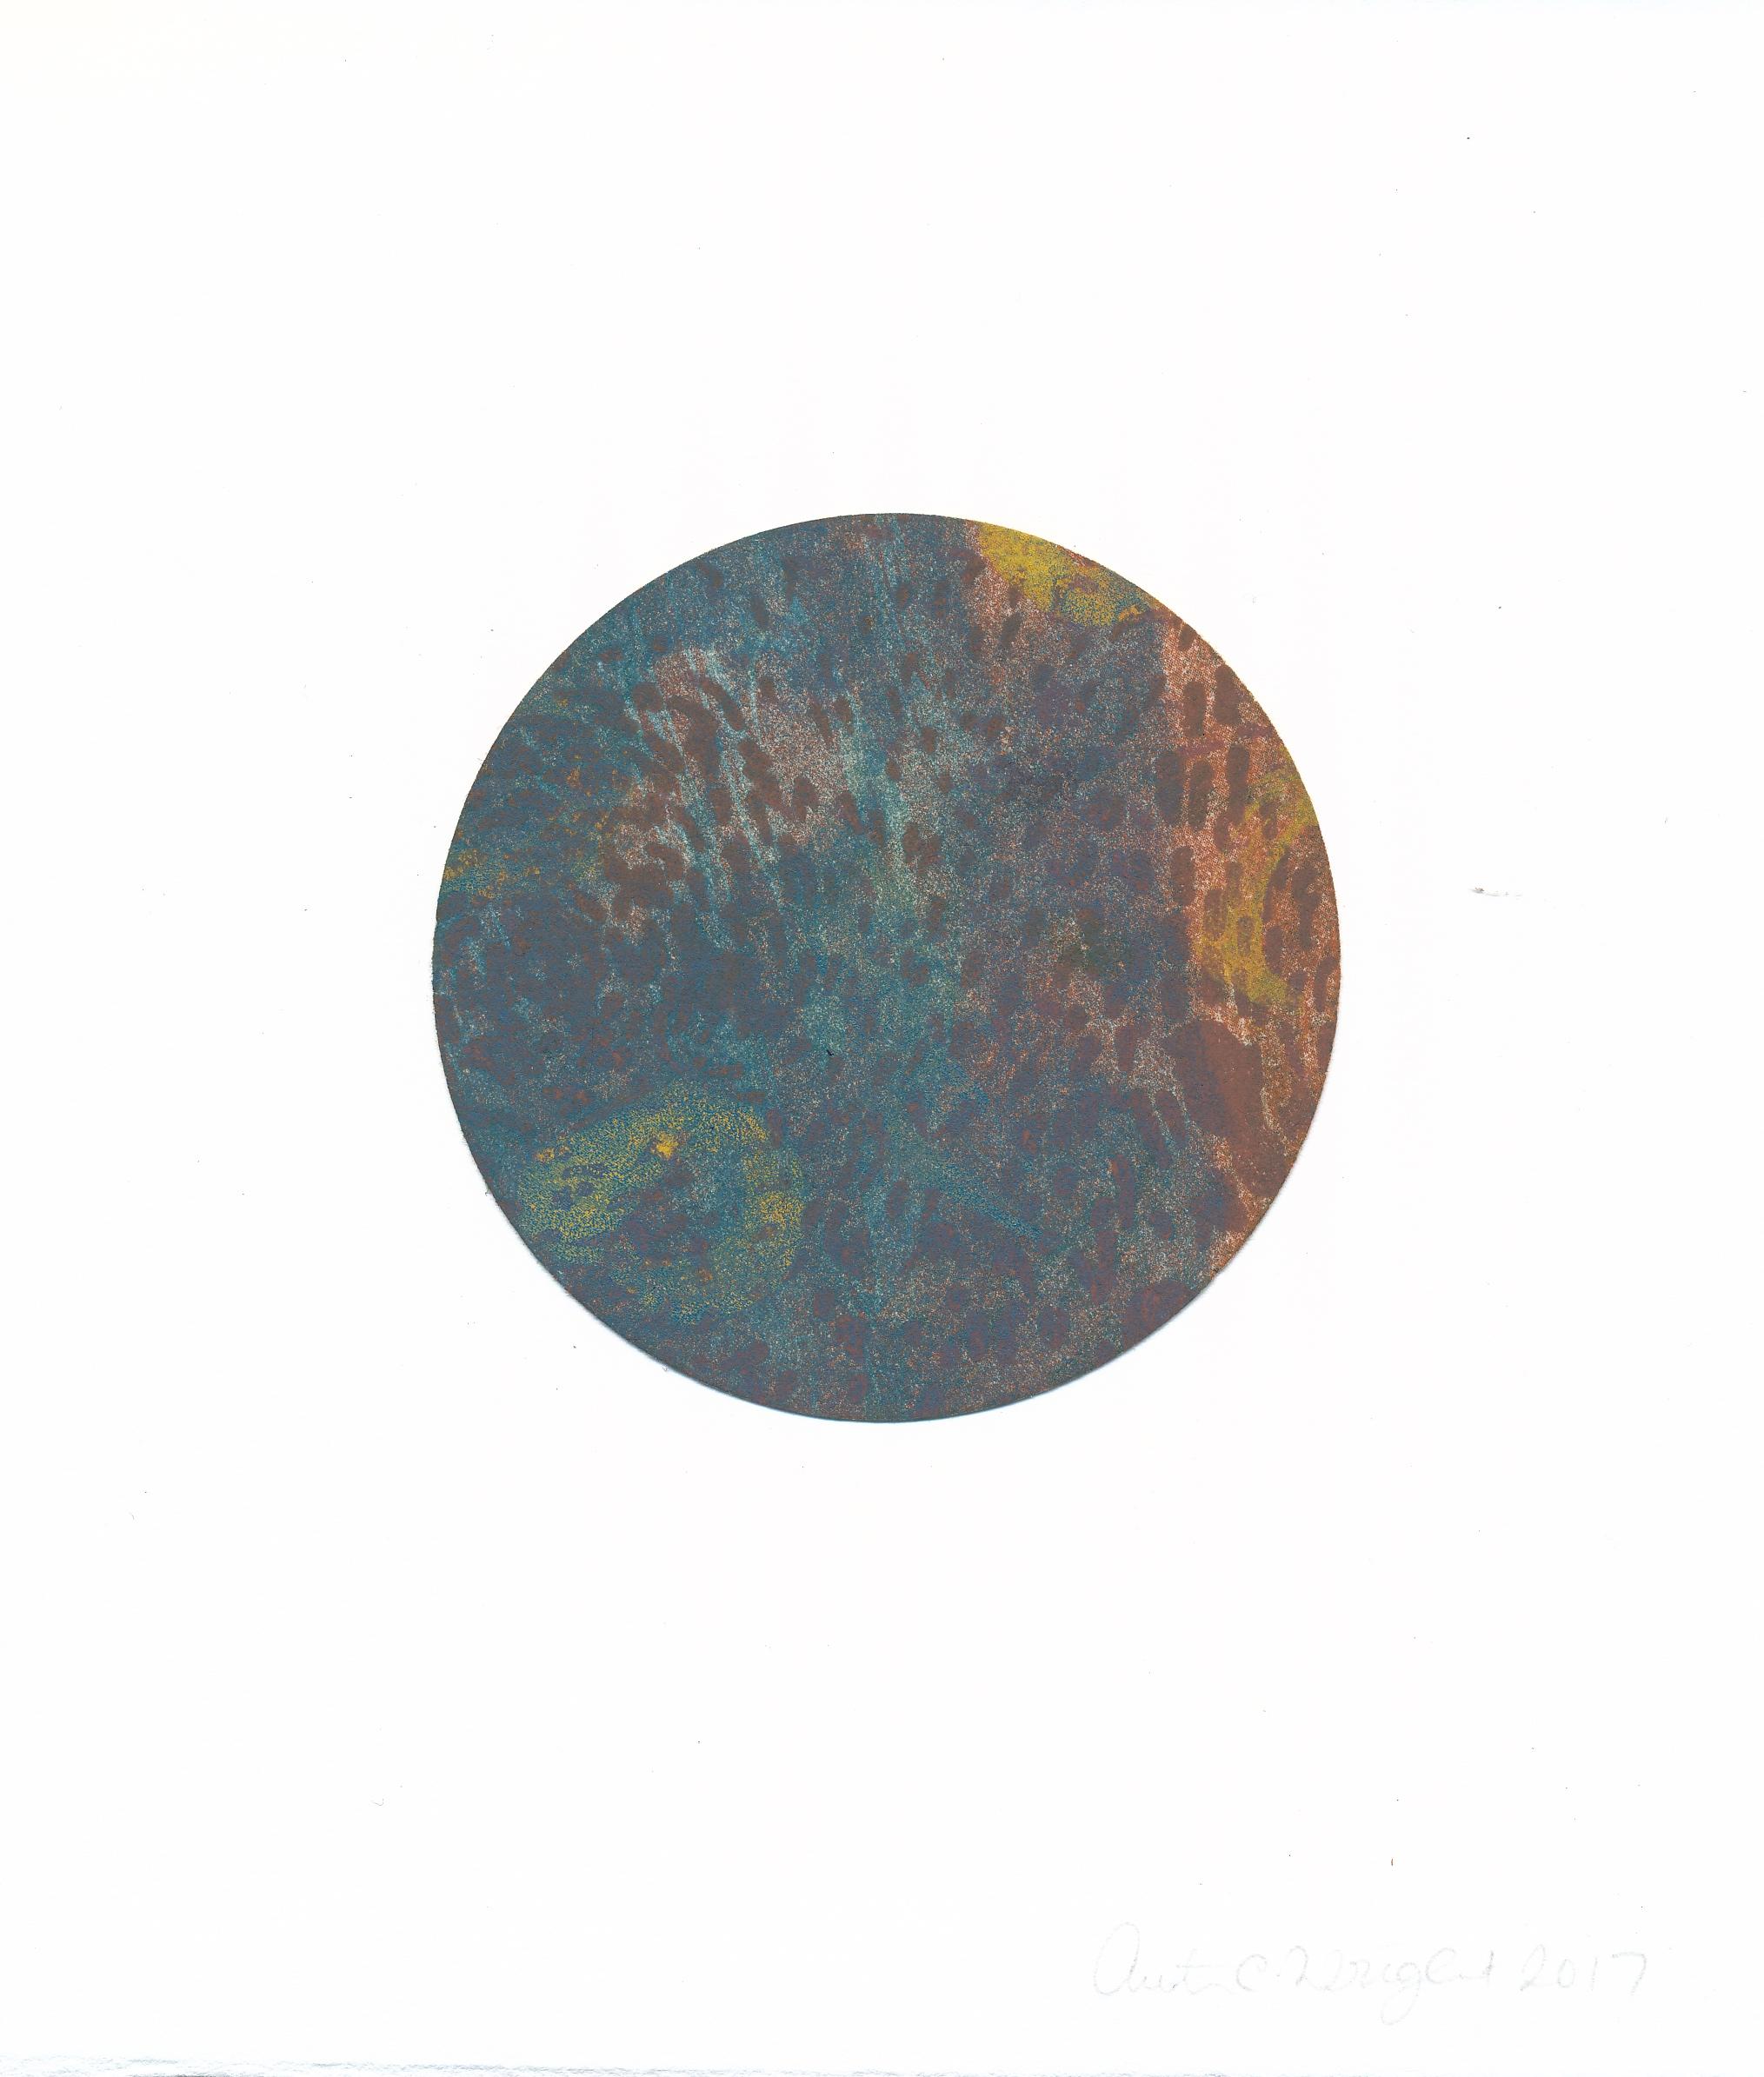 circle196.jpg